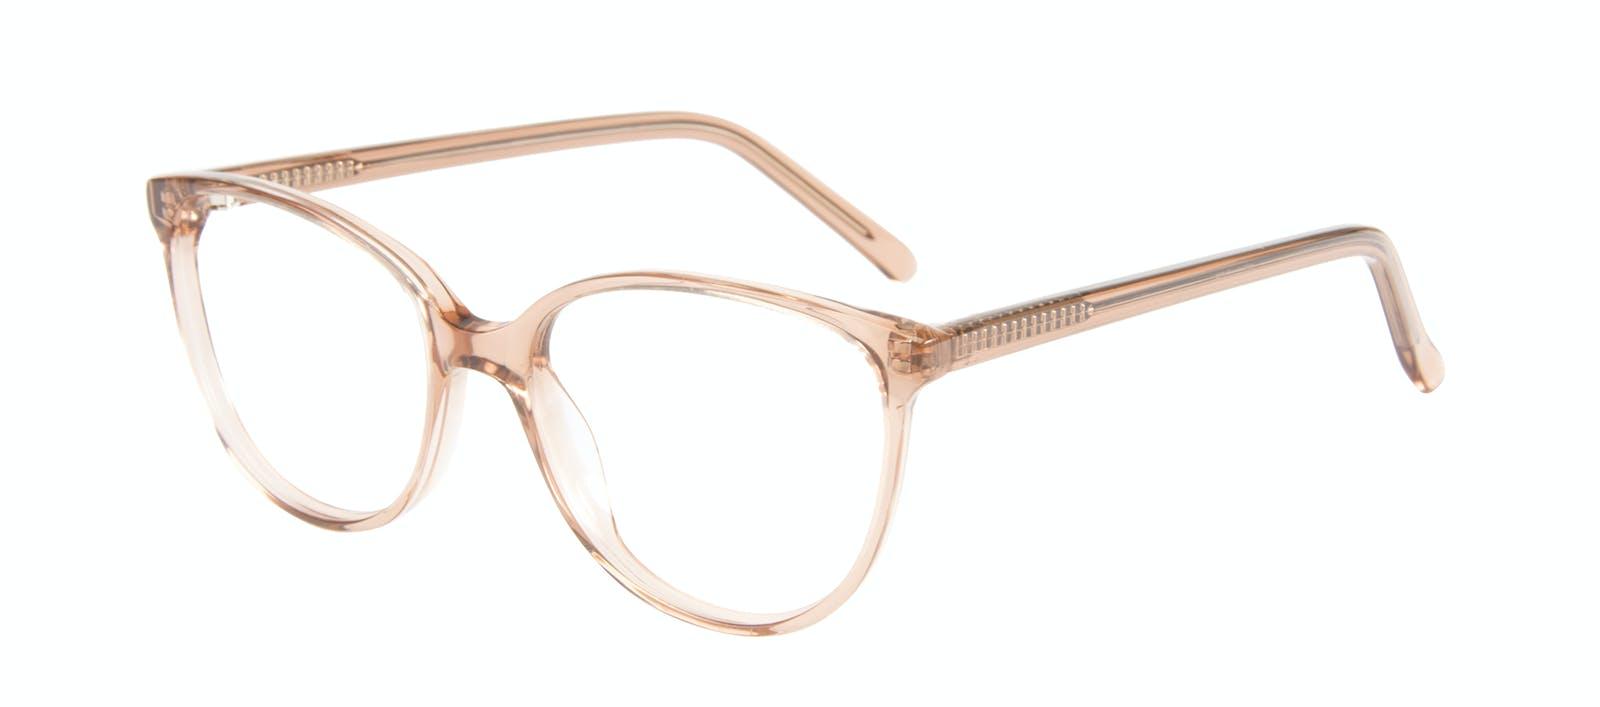 Women\'s Eyeglasses - Imagine Petite in Rose   BonLook